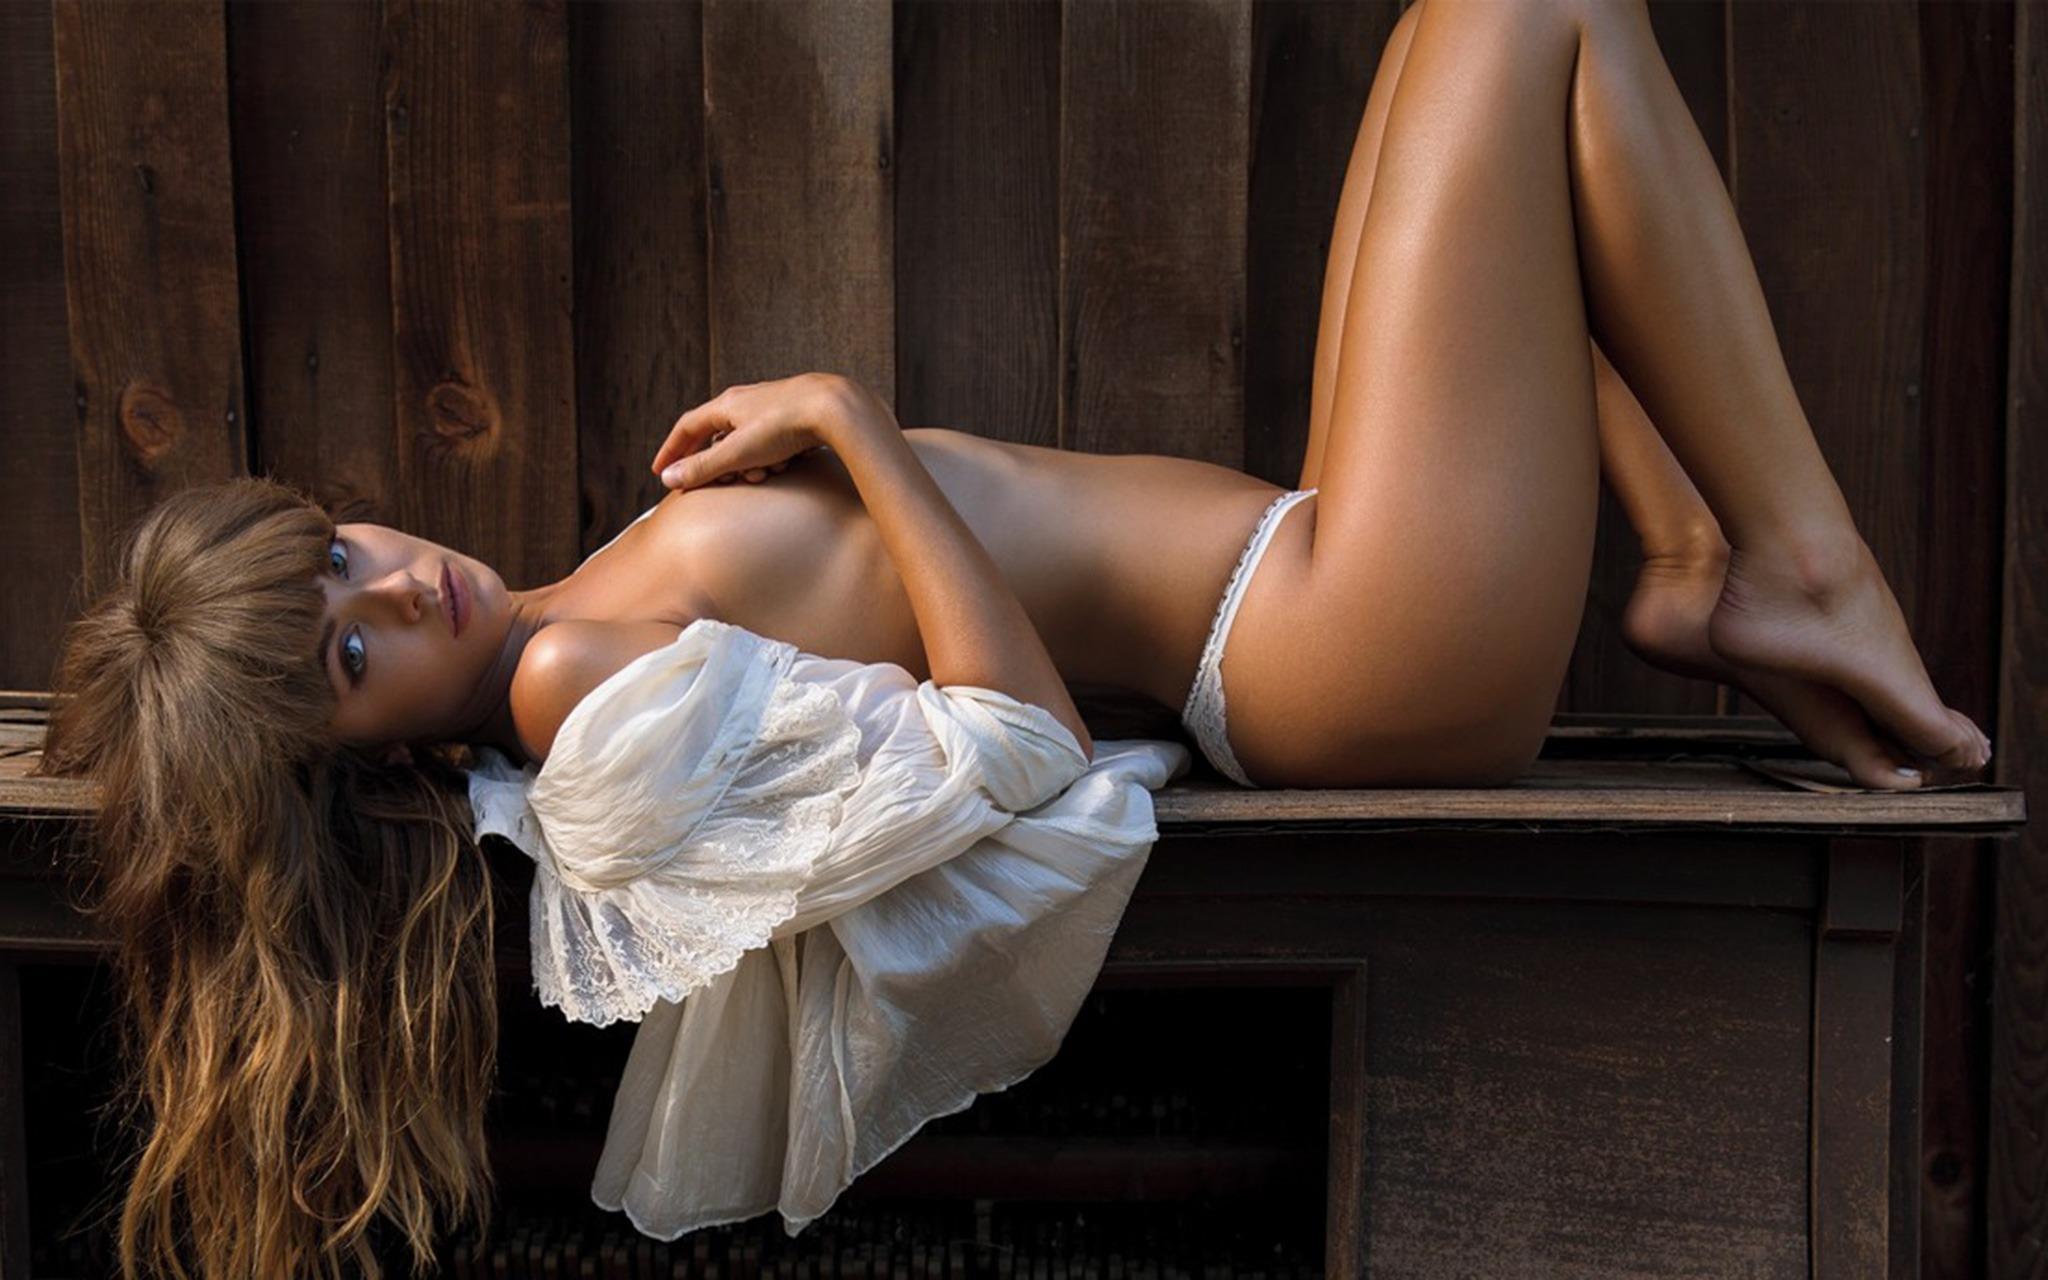 Playboy carmella rose Carmella Rose